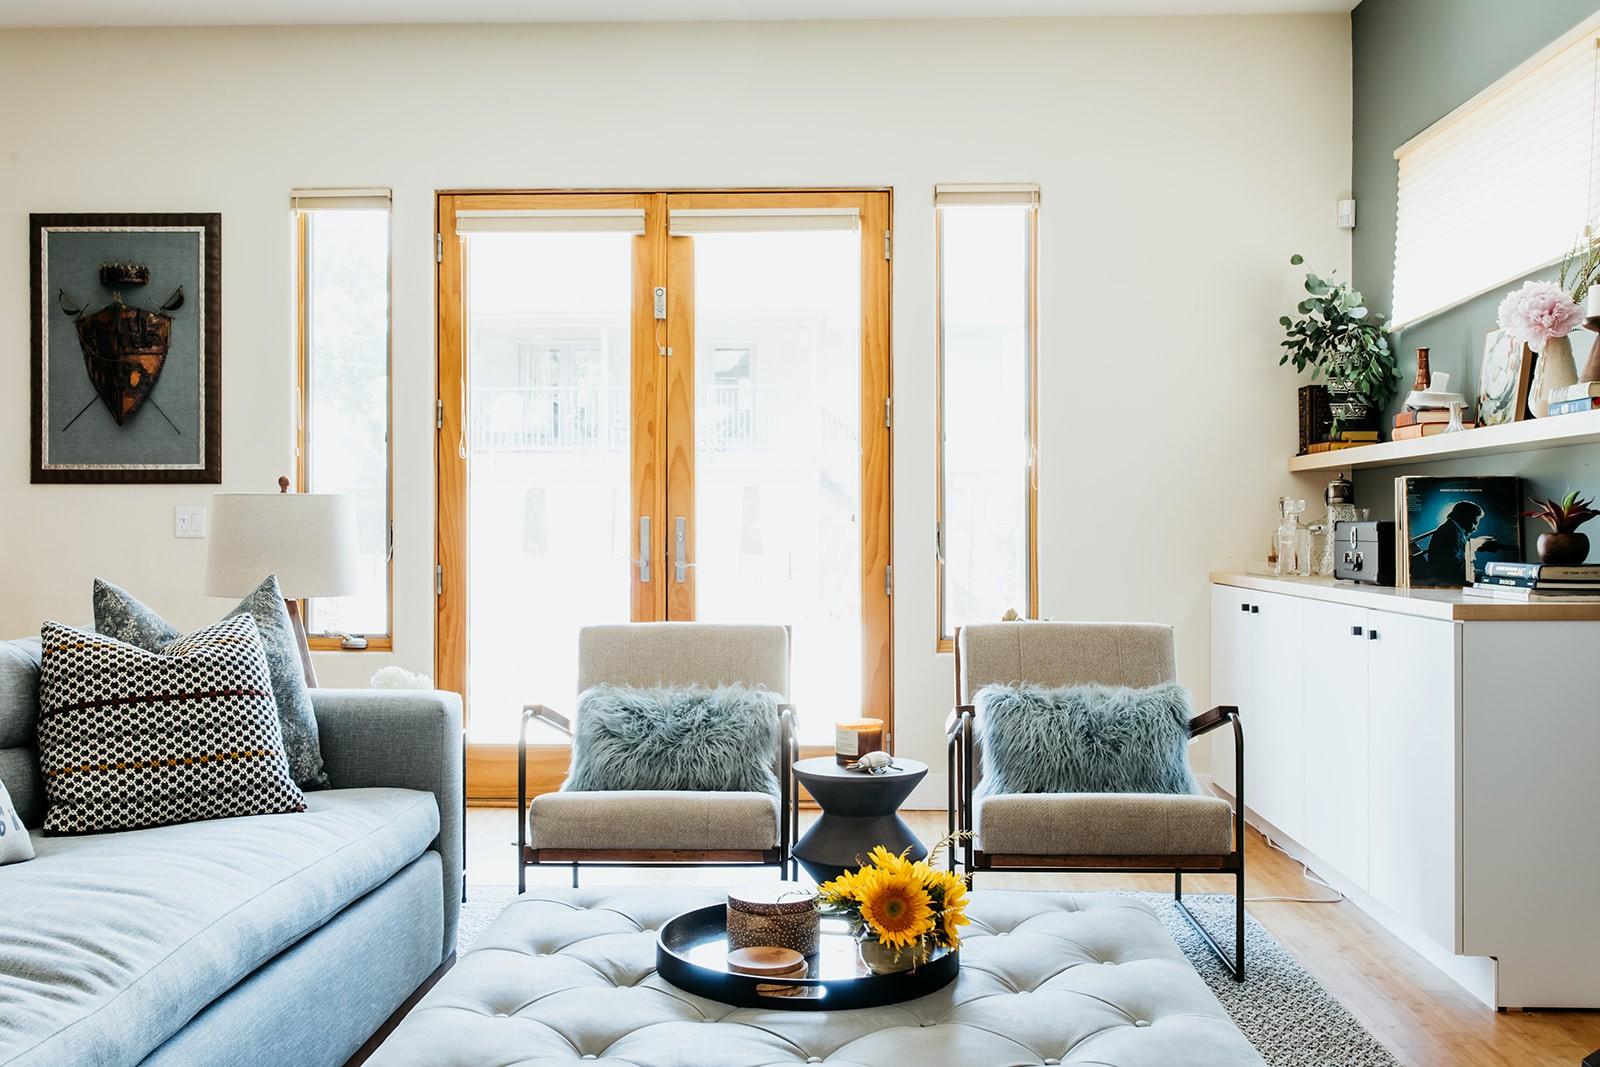 20180613_Nicolette_Lovell_Sacramento_Interior_Studio Plumb-9656